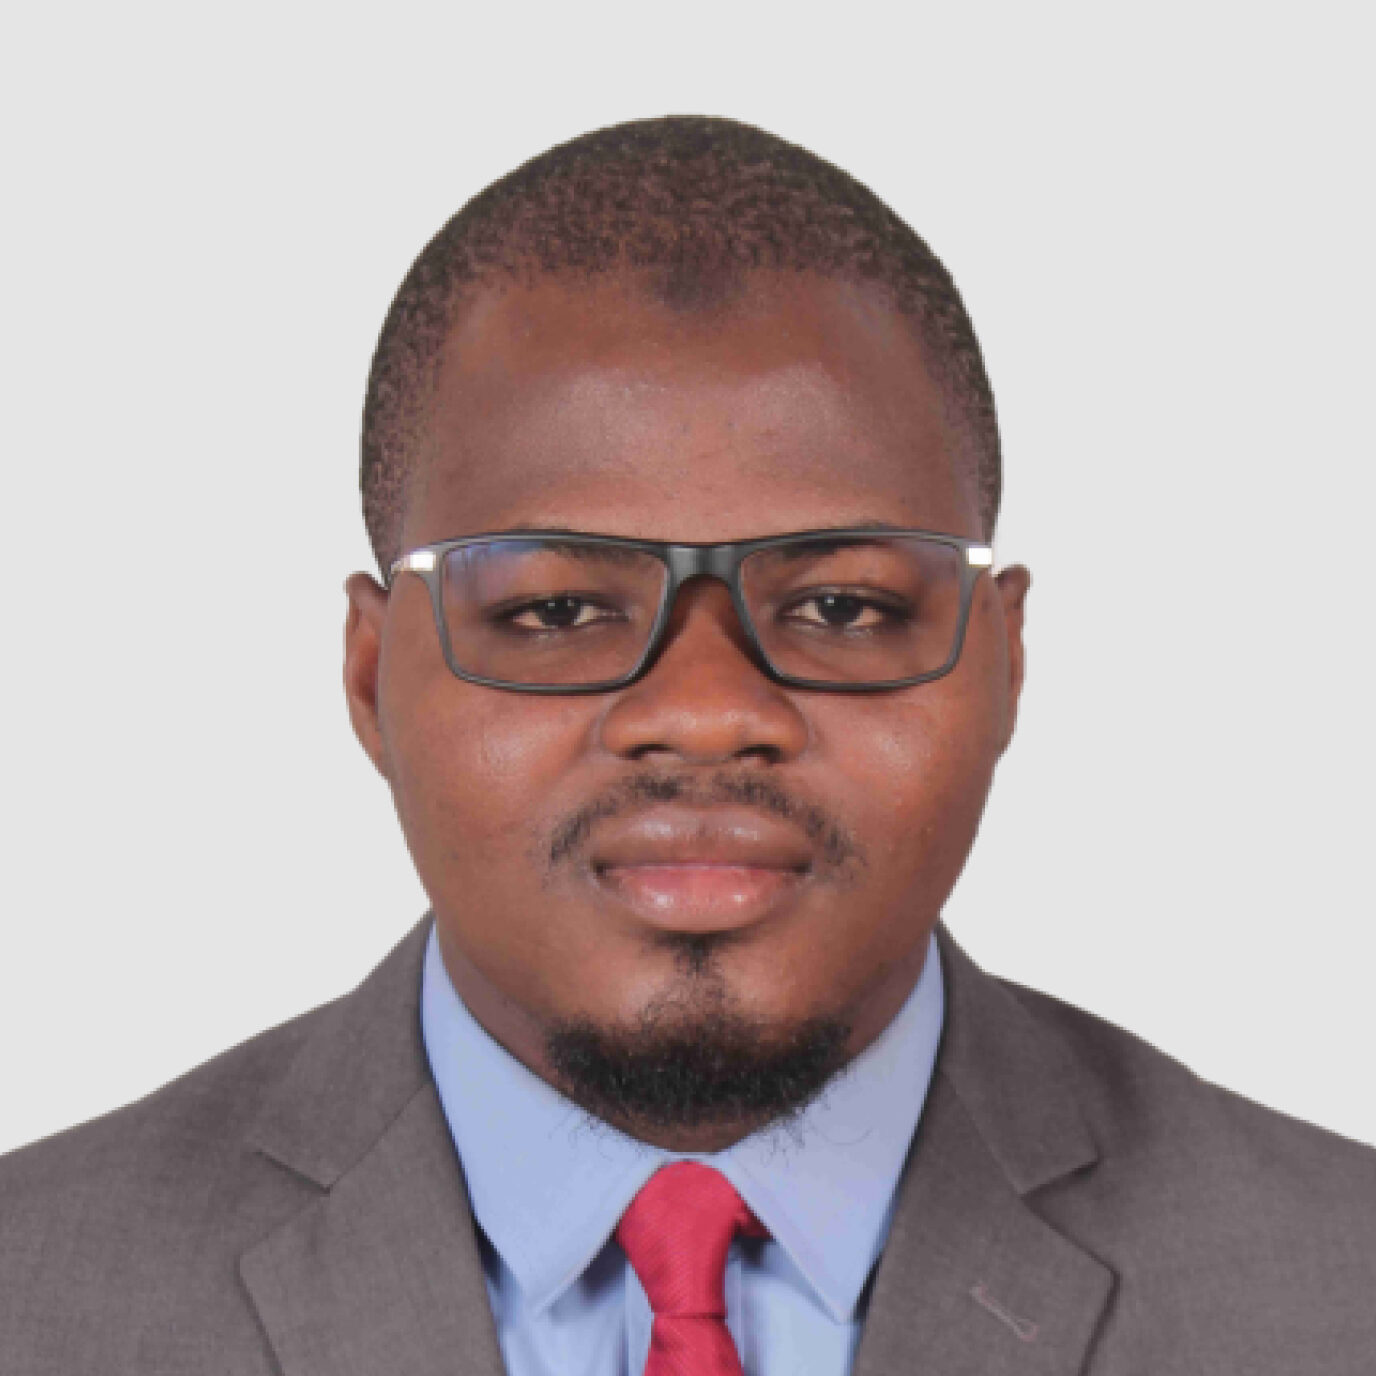 http://devafrique.com/wp-content/uploads/2021/07/Abdoul-Bassit-Sawadogo-Consultant-Burkina-Fasoto-2-e1631730131421.jpg